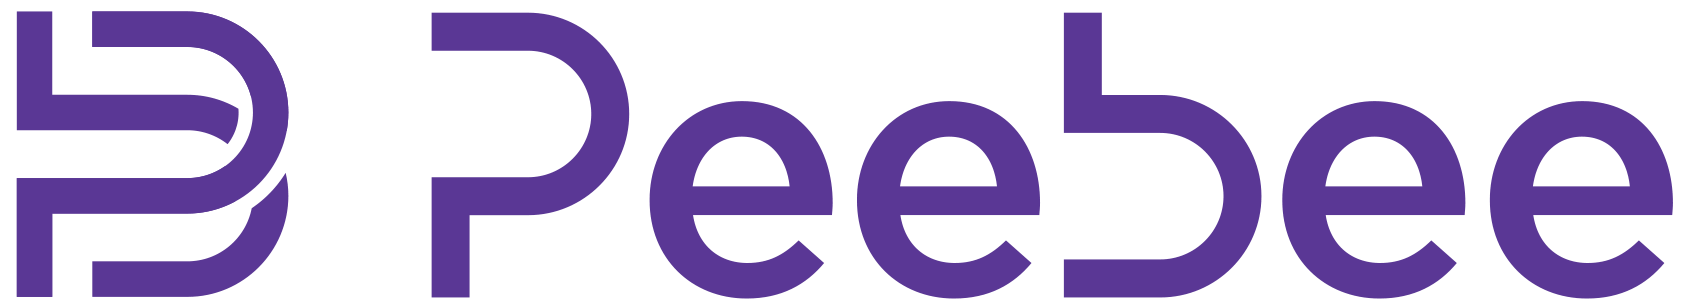 peebee logo